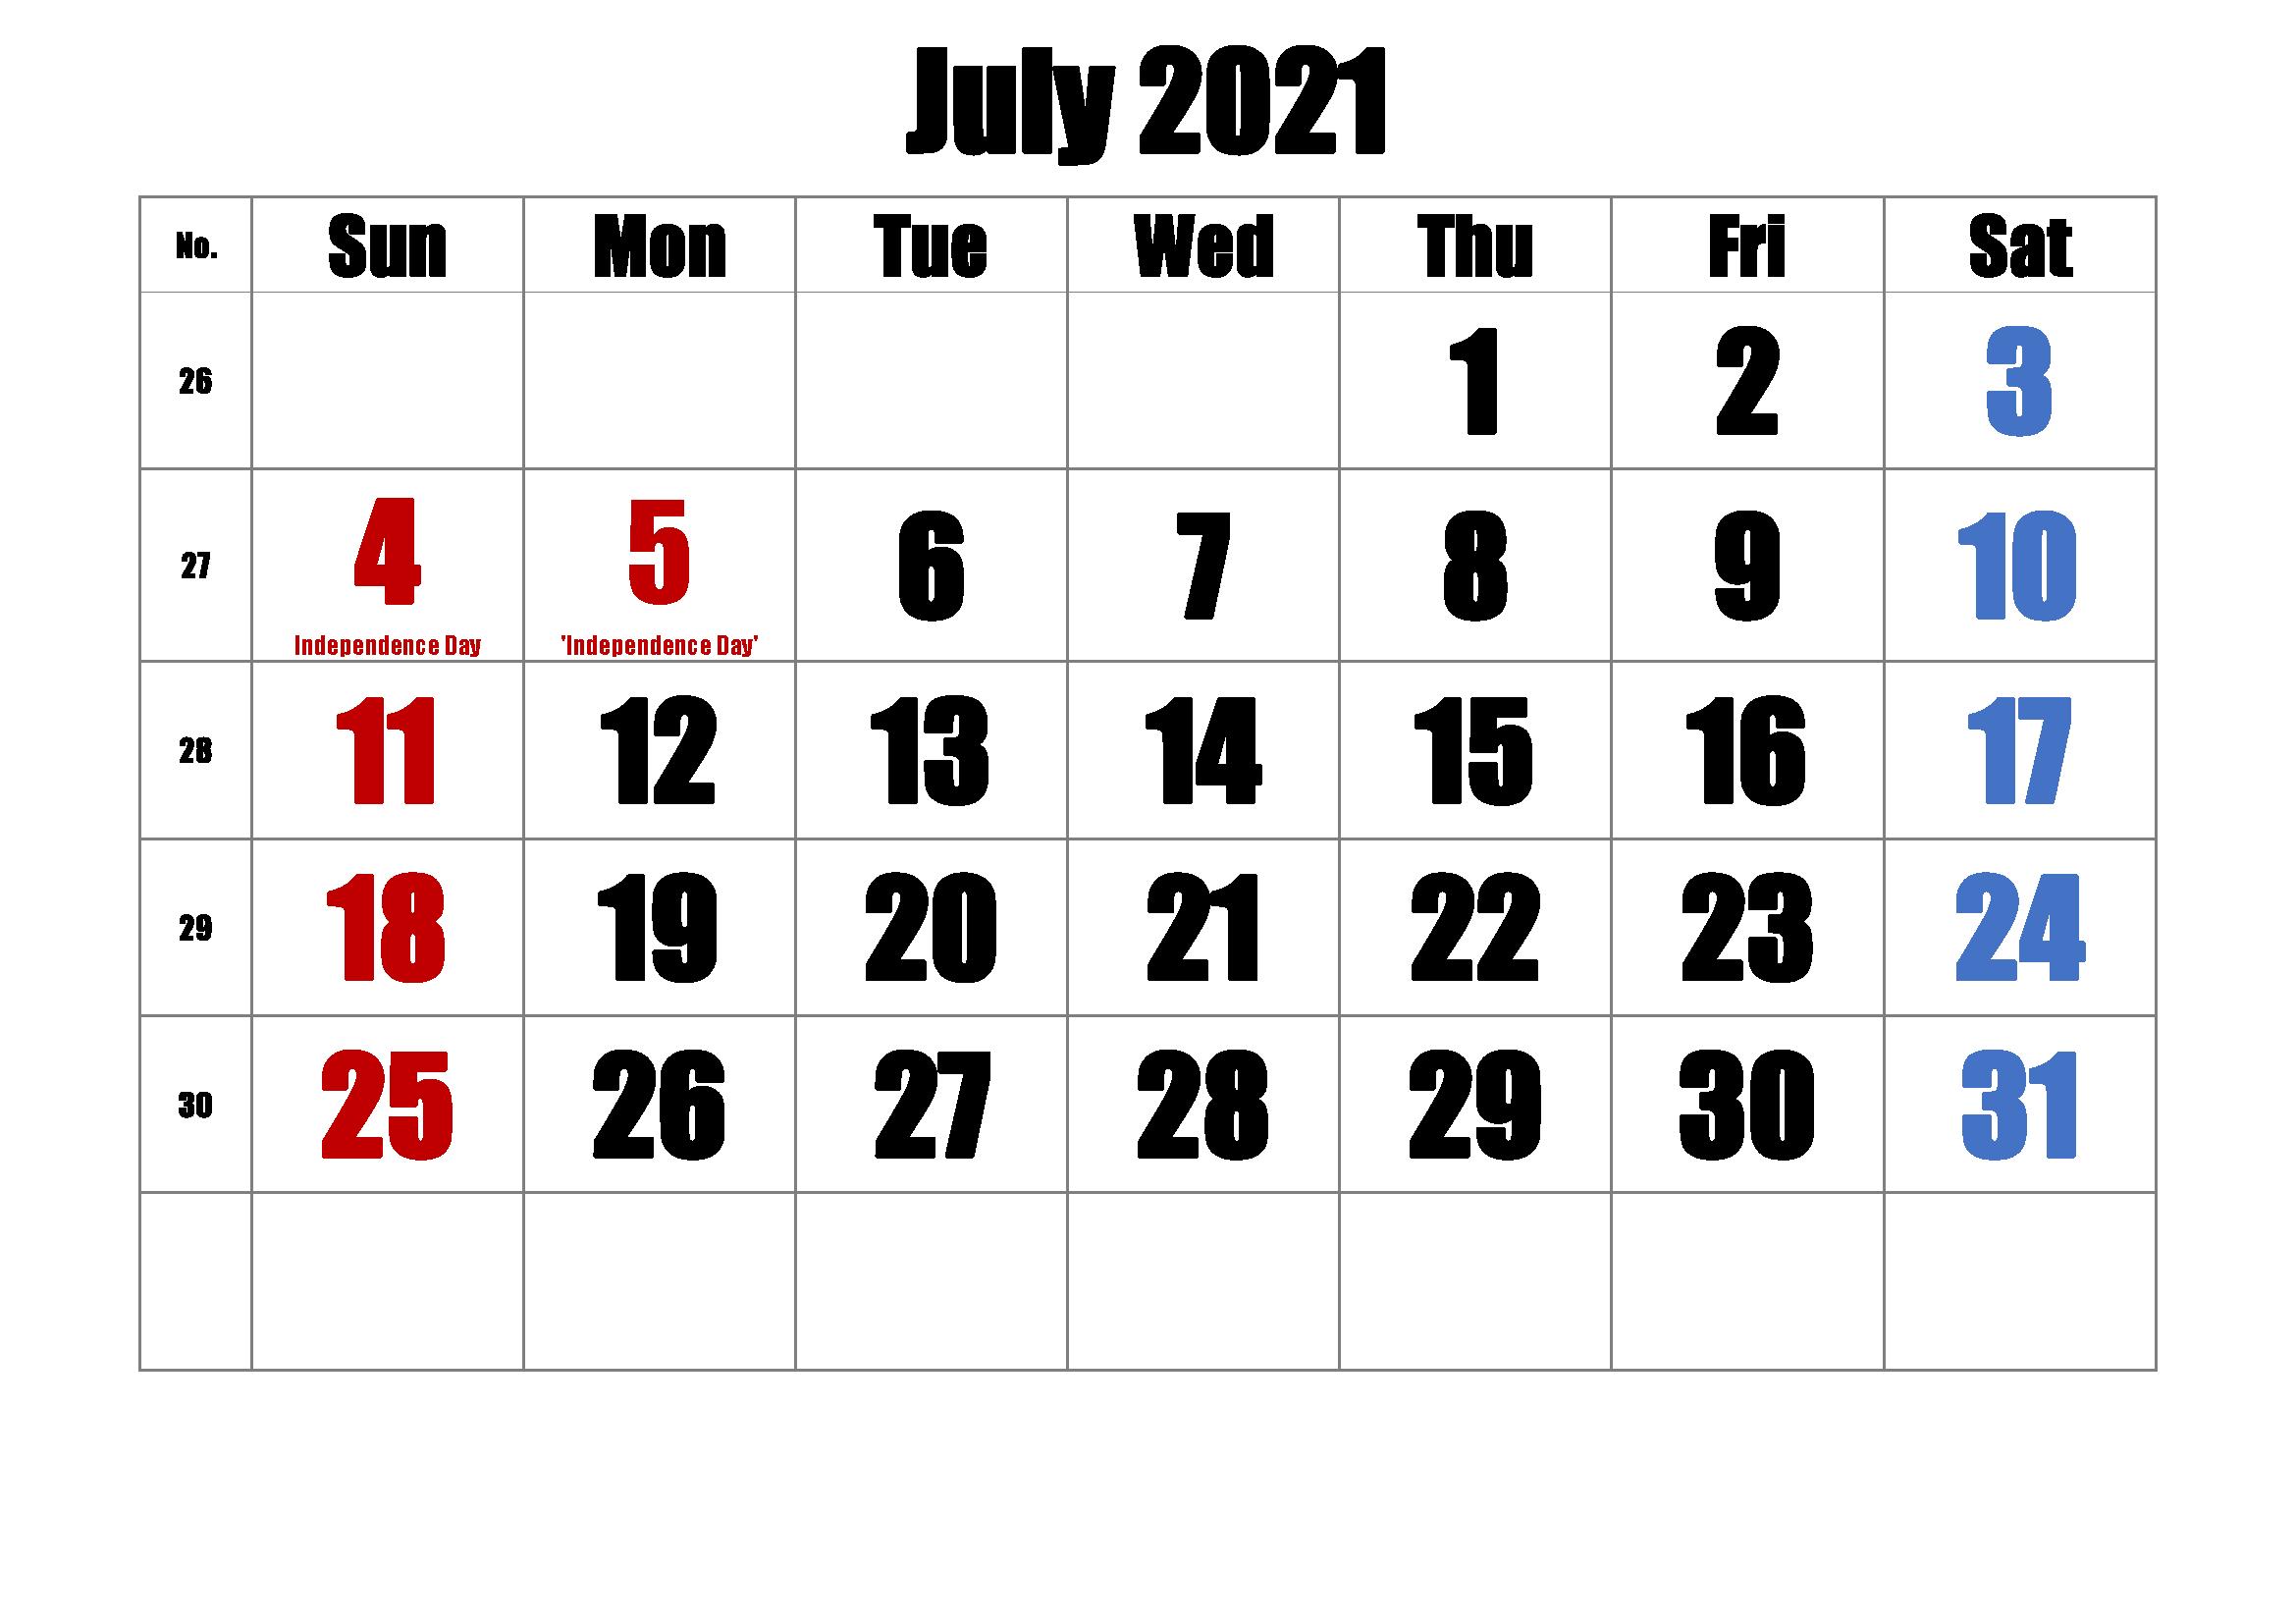 June 2021 Federal Holidays Calendar